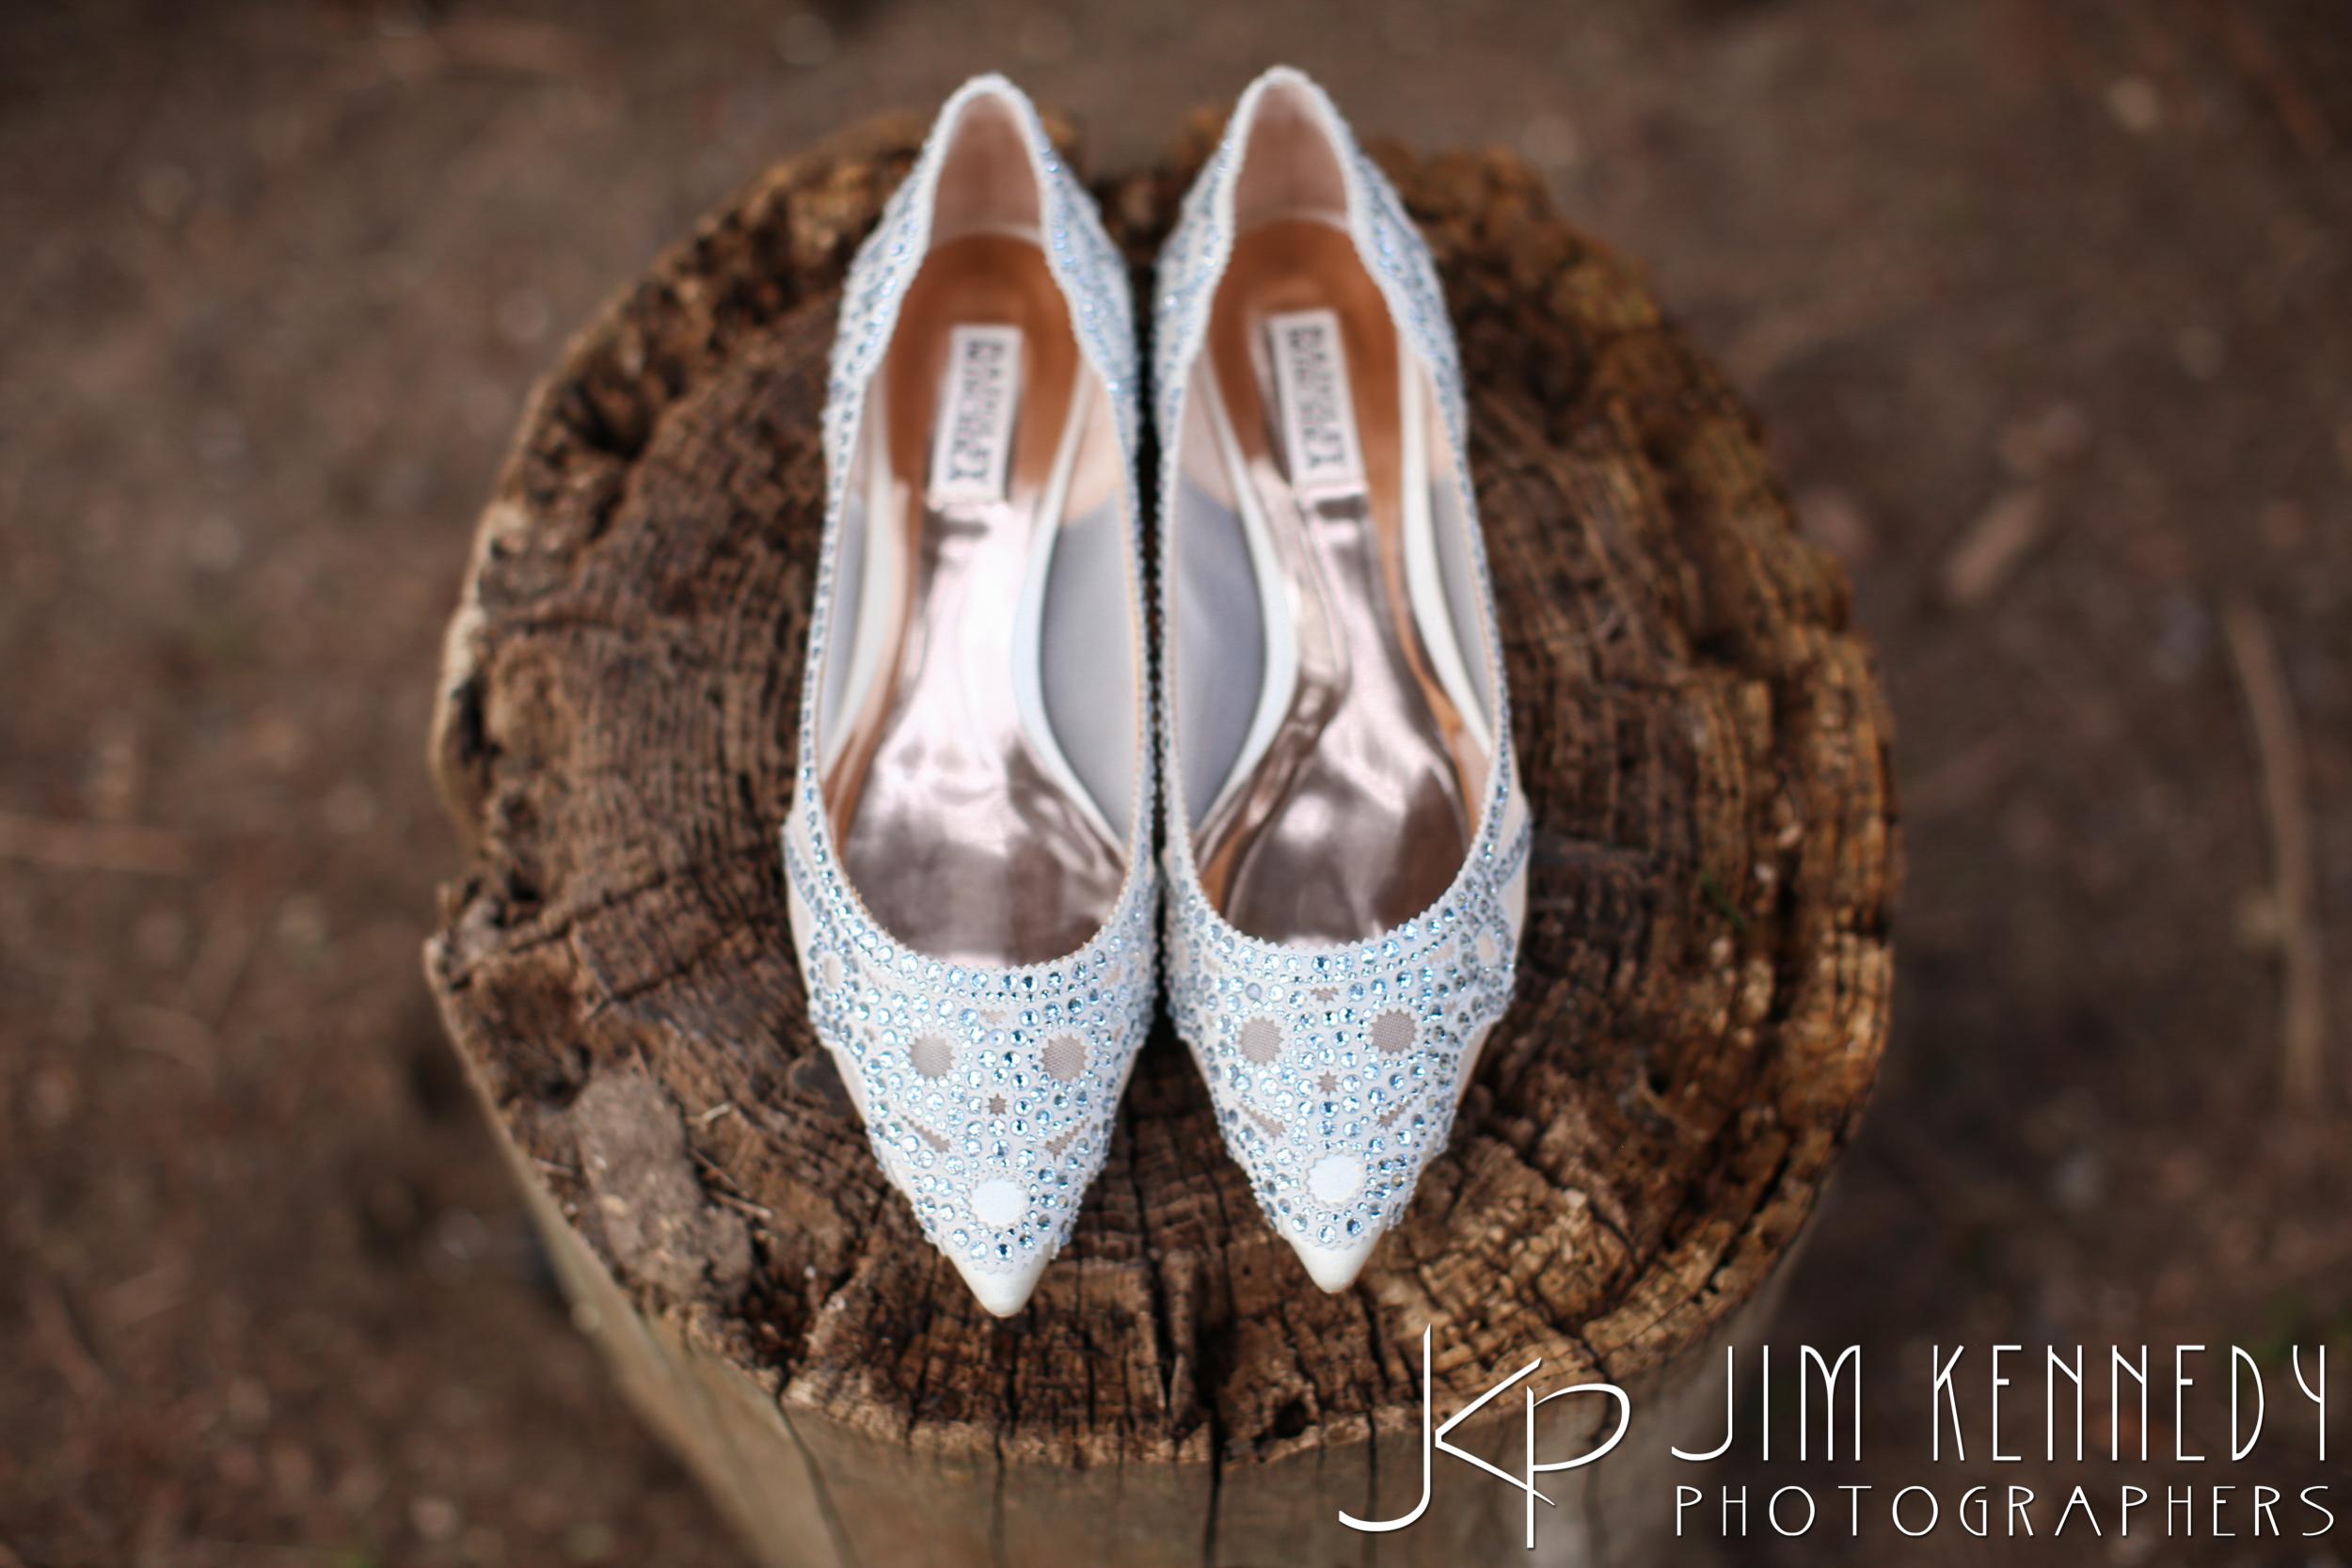 jim_kennedy_photographers_highland_springs_wedding_caitlyn_0003.jpg